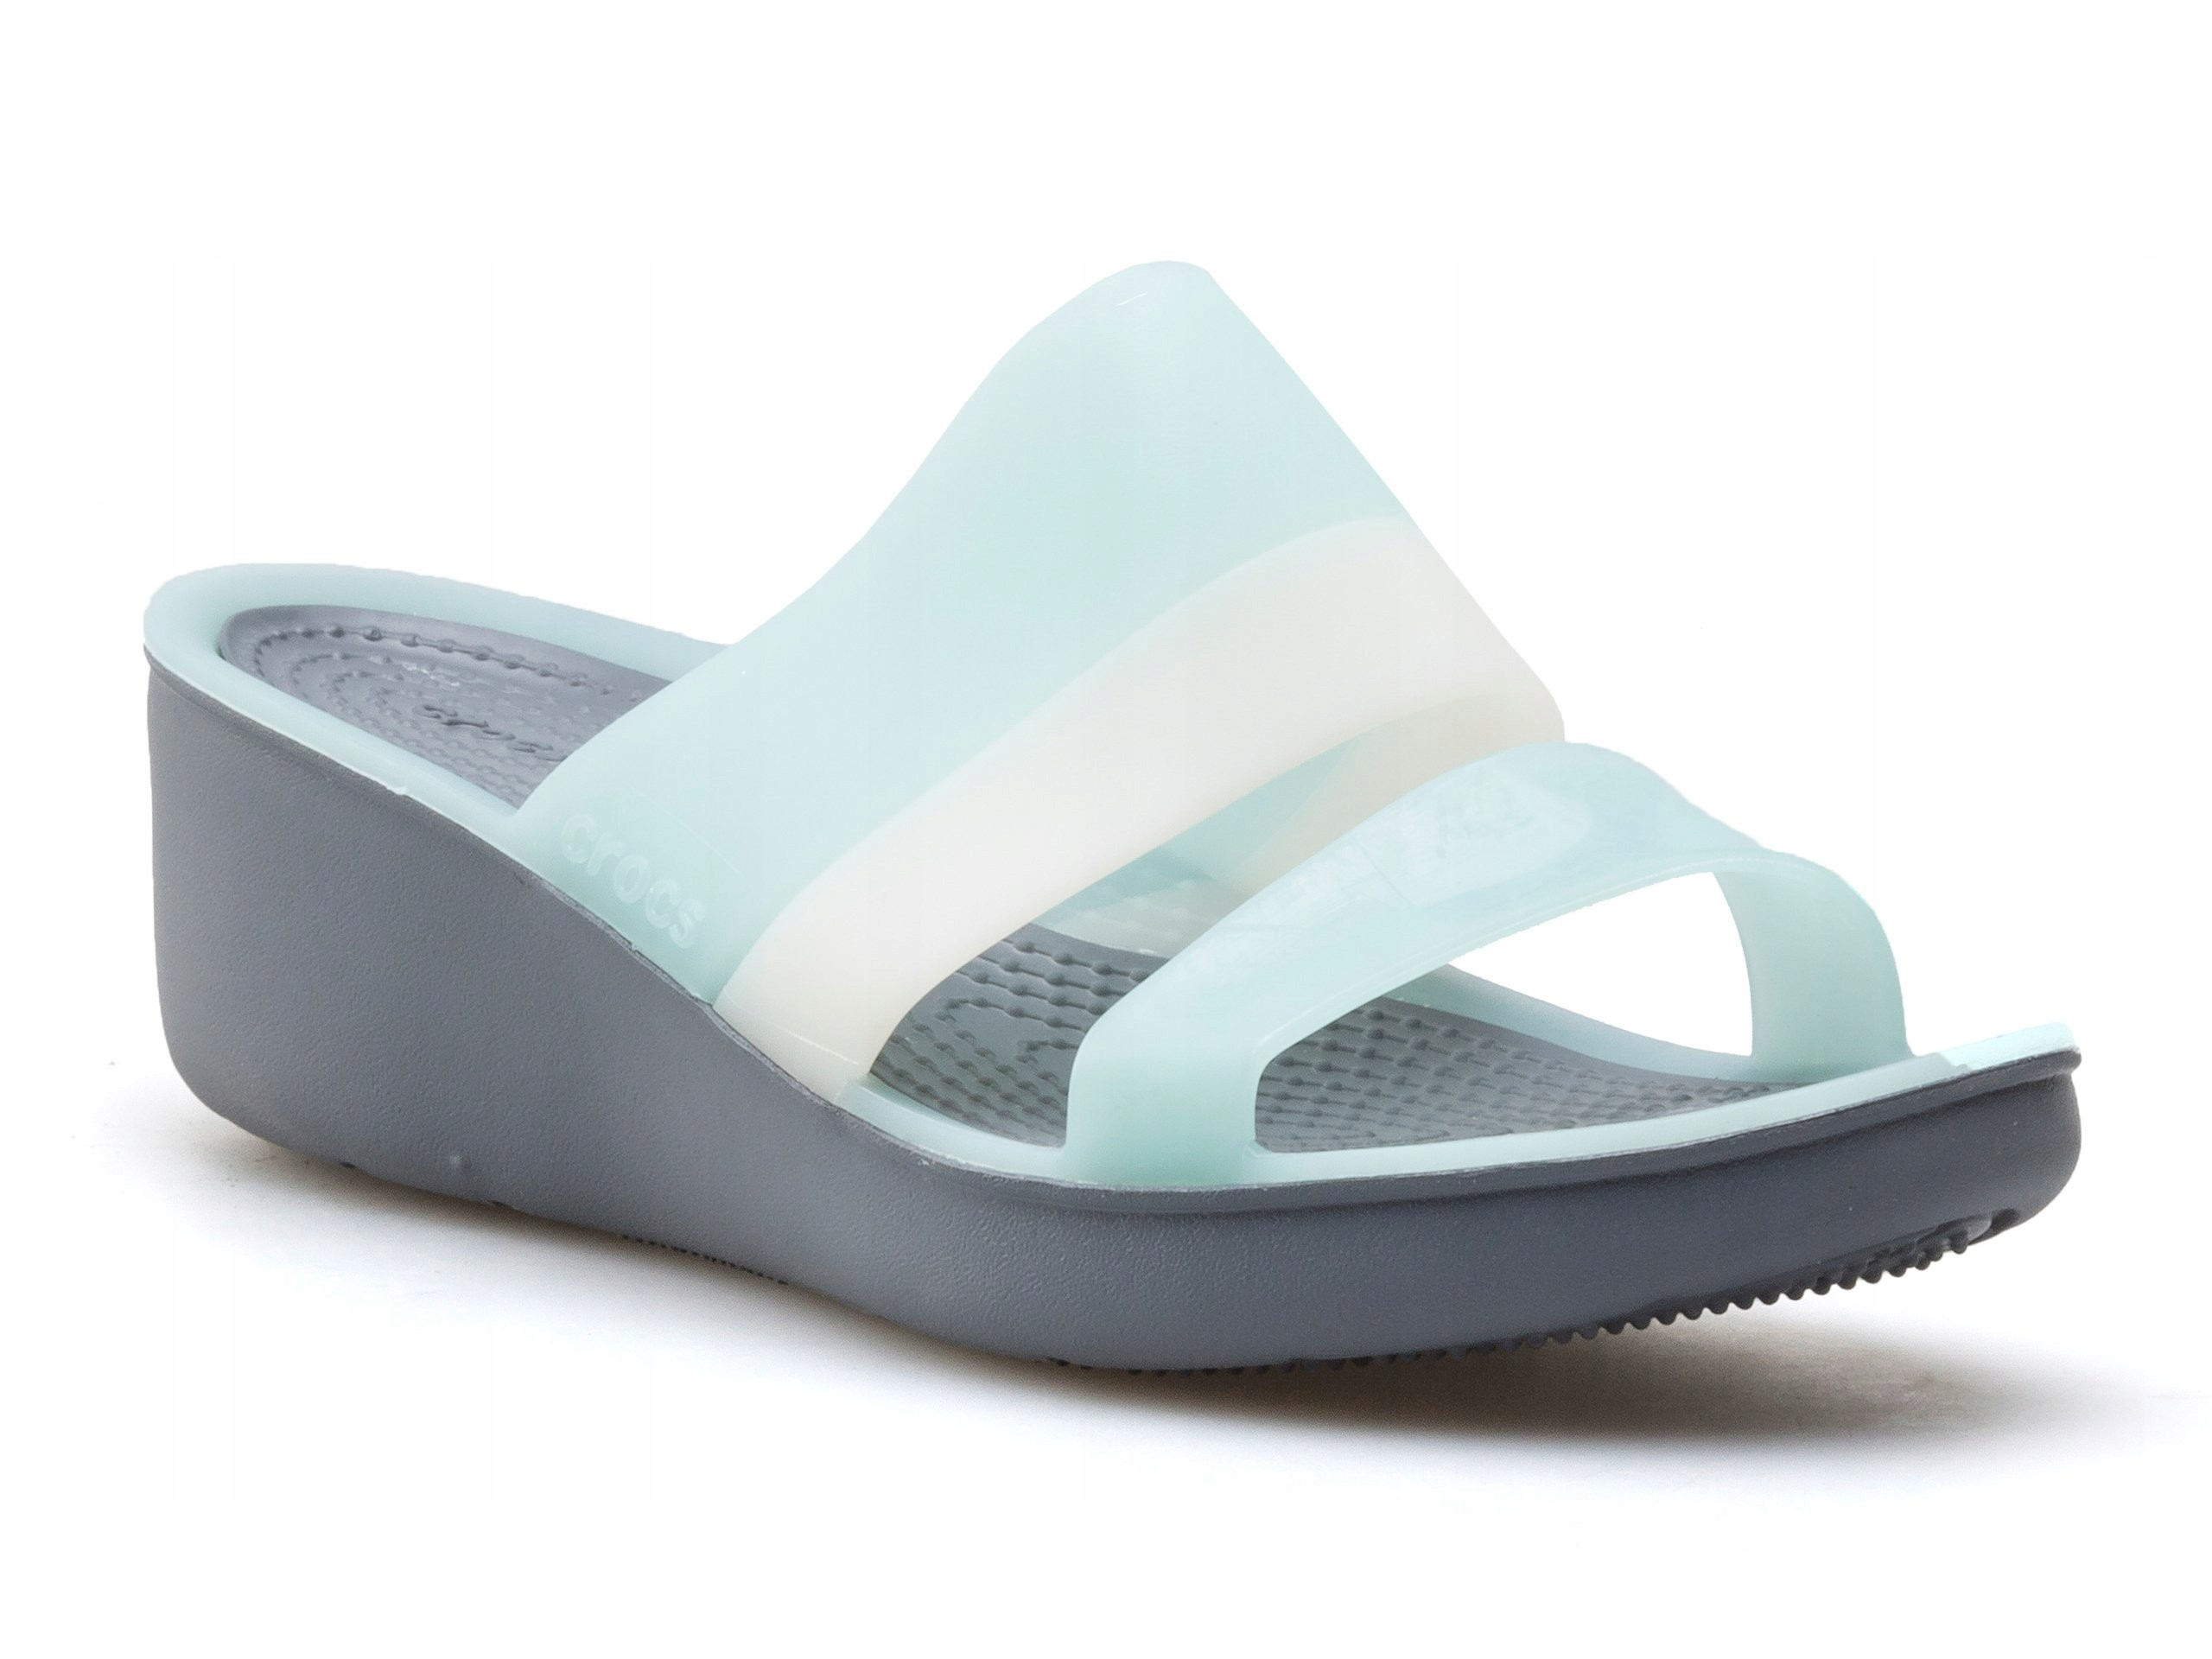 Sandały Crocs Colorblock Wedge 200031 455 r. 39 40